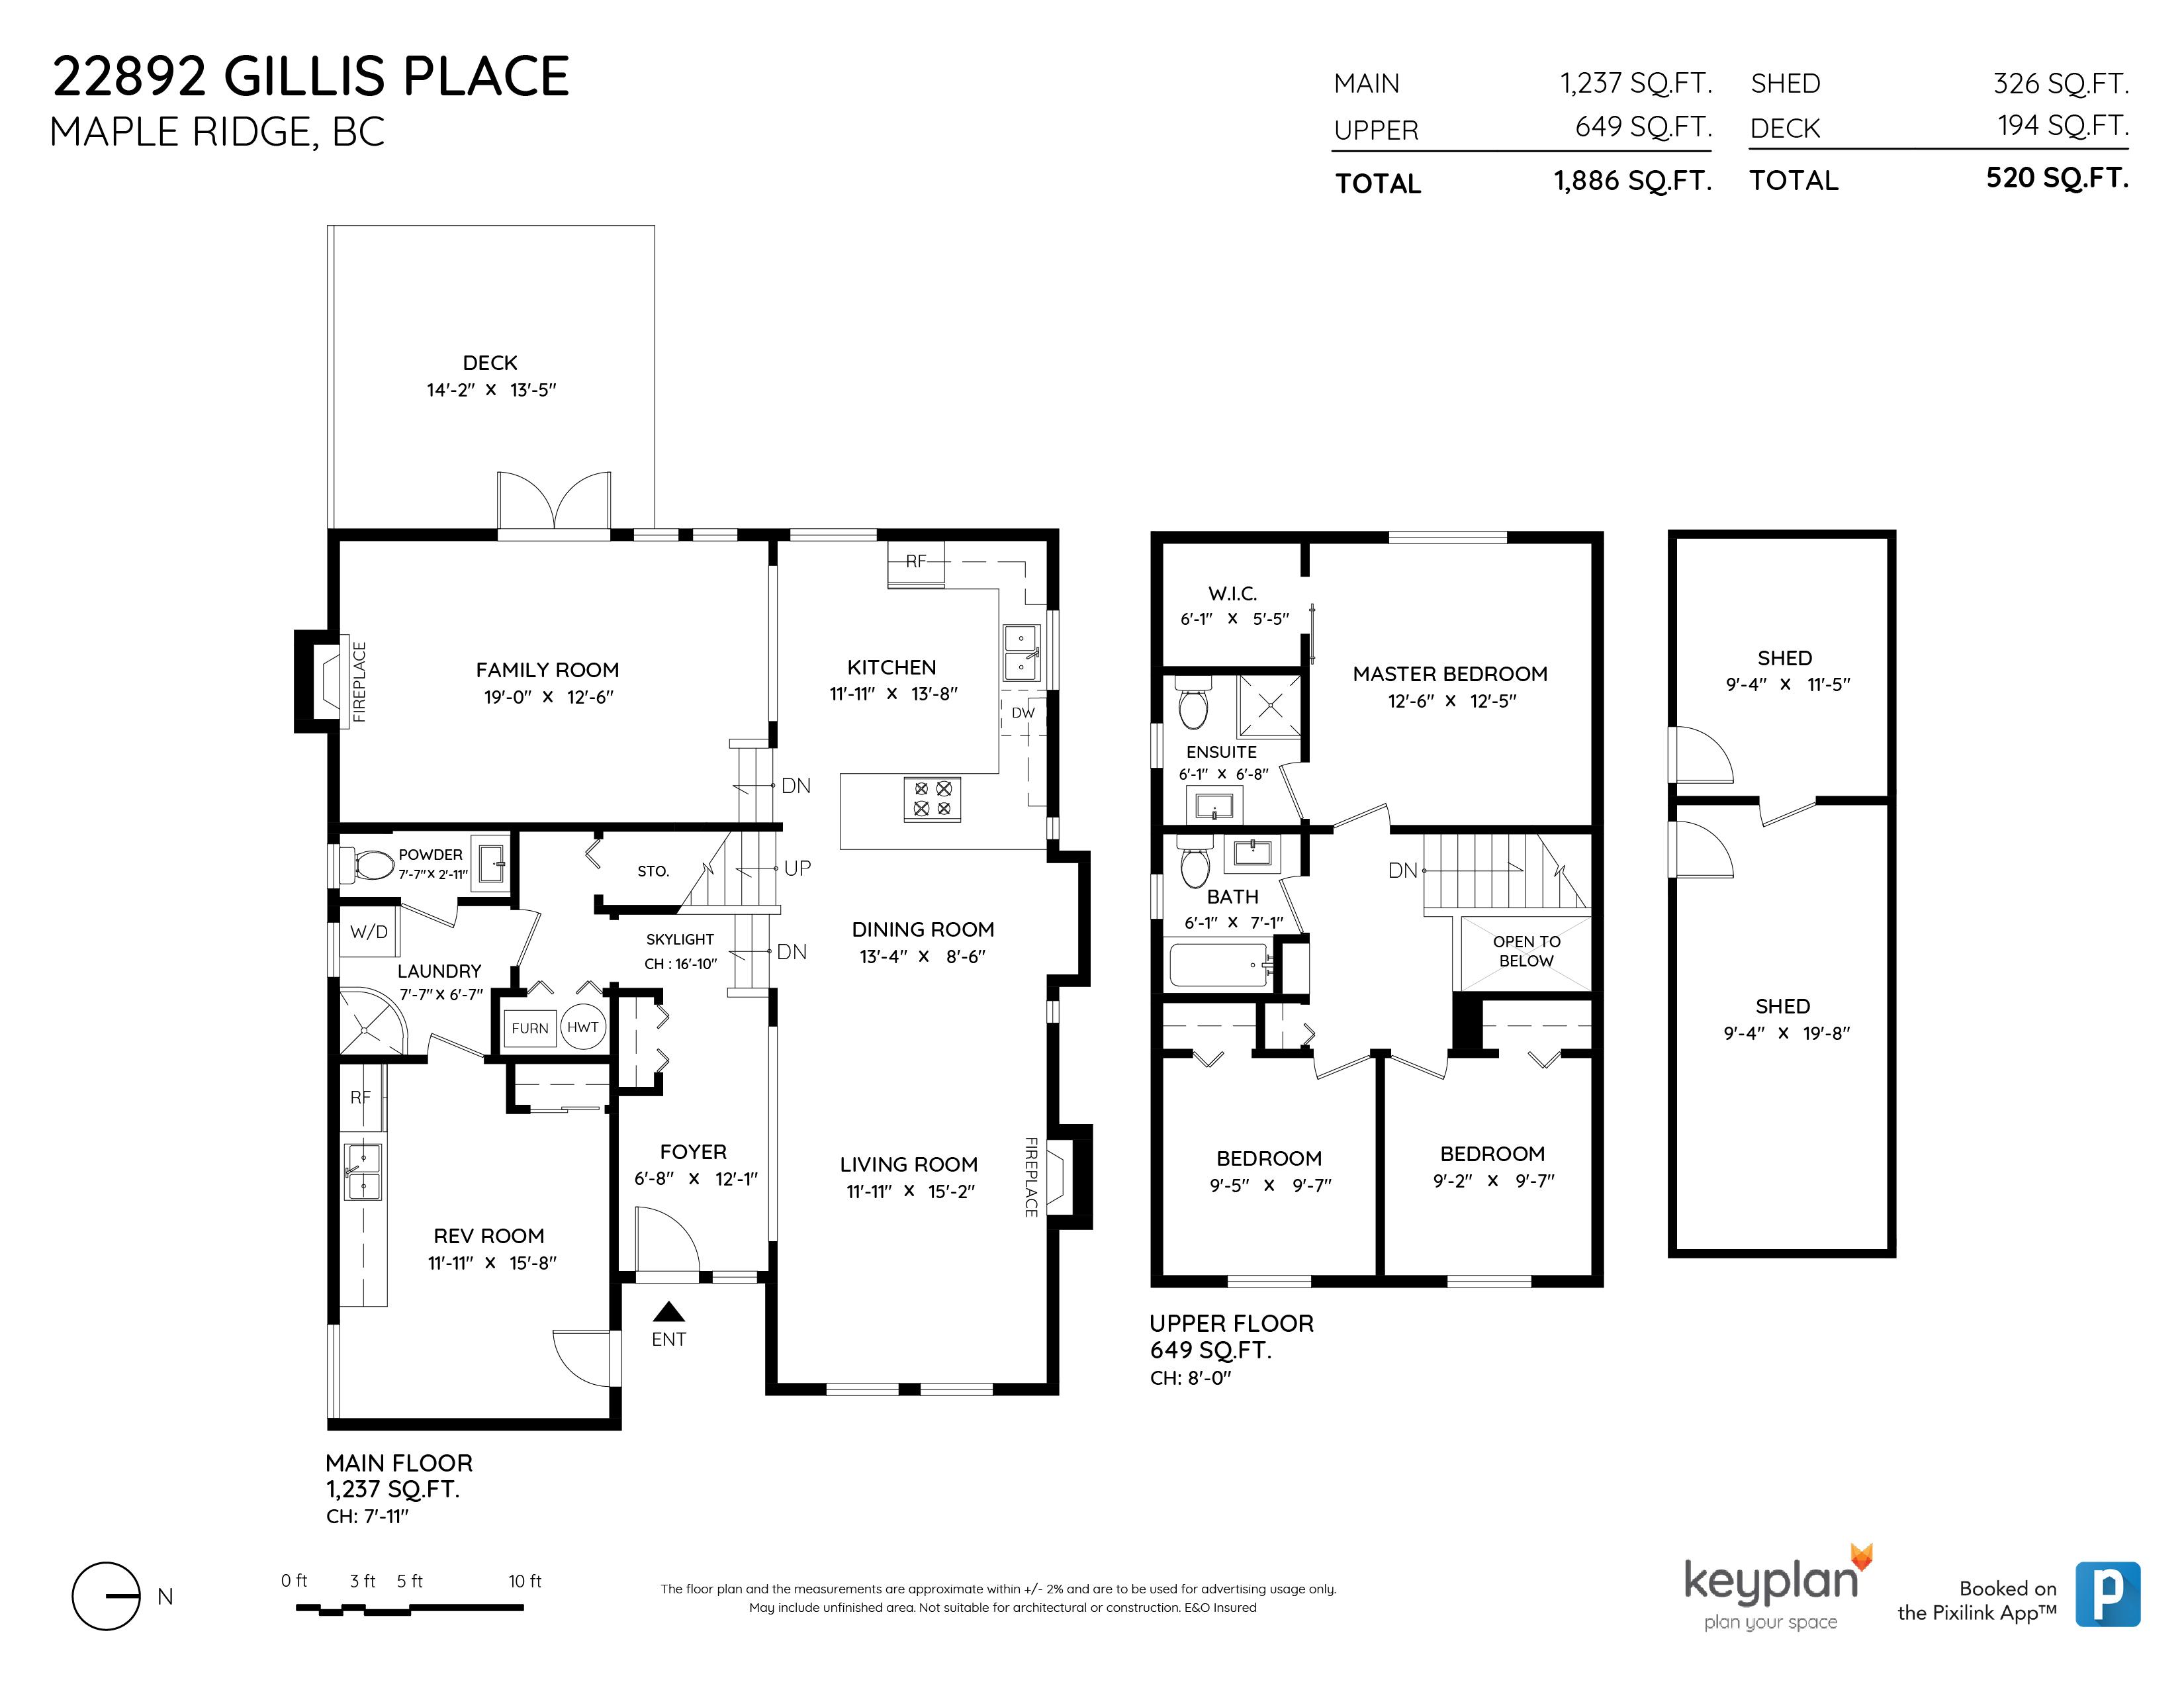 22892 GILLIS PLACE, Maple Ridge, BC Floor Plan